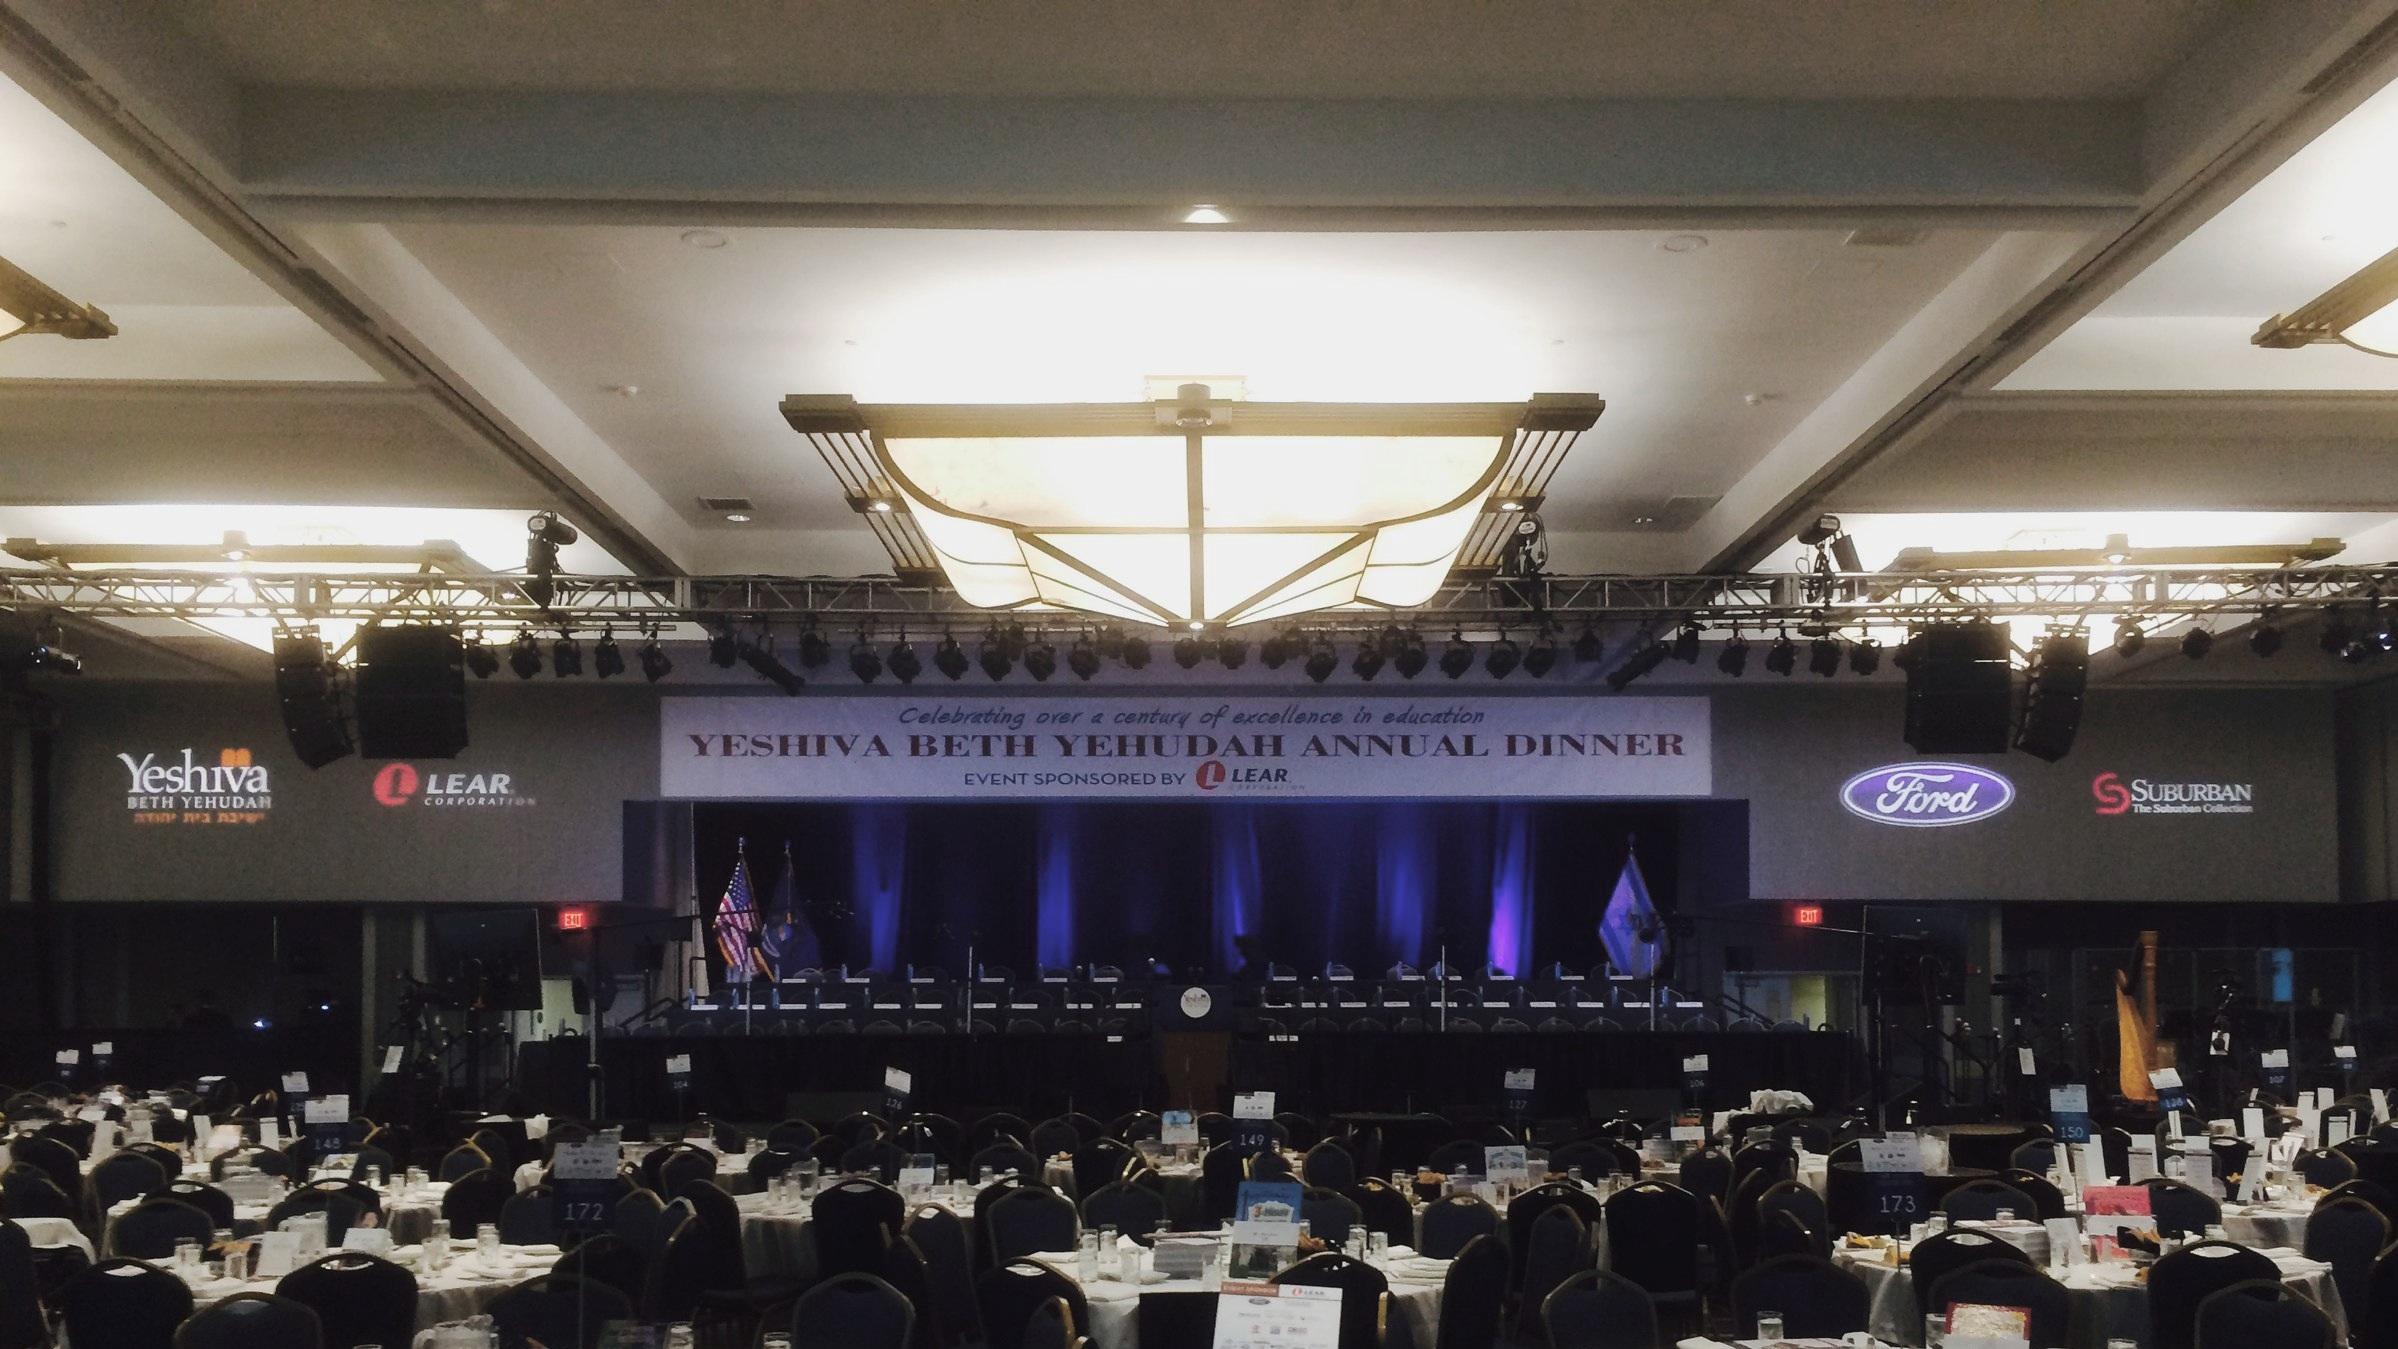 Corporate event in Renaissance Ballroom